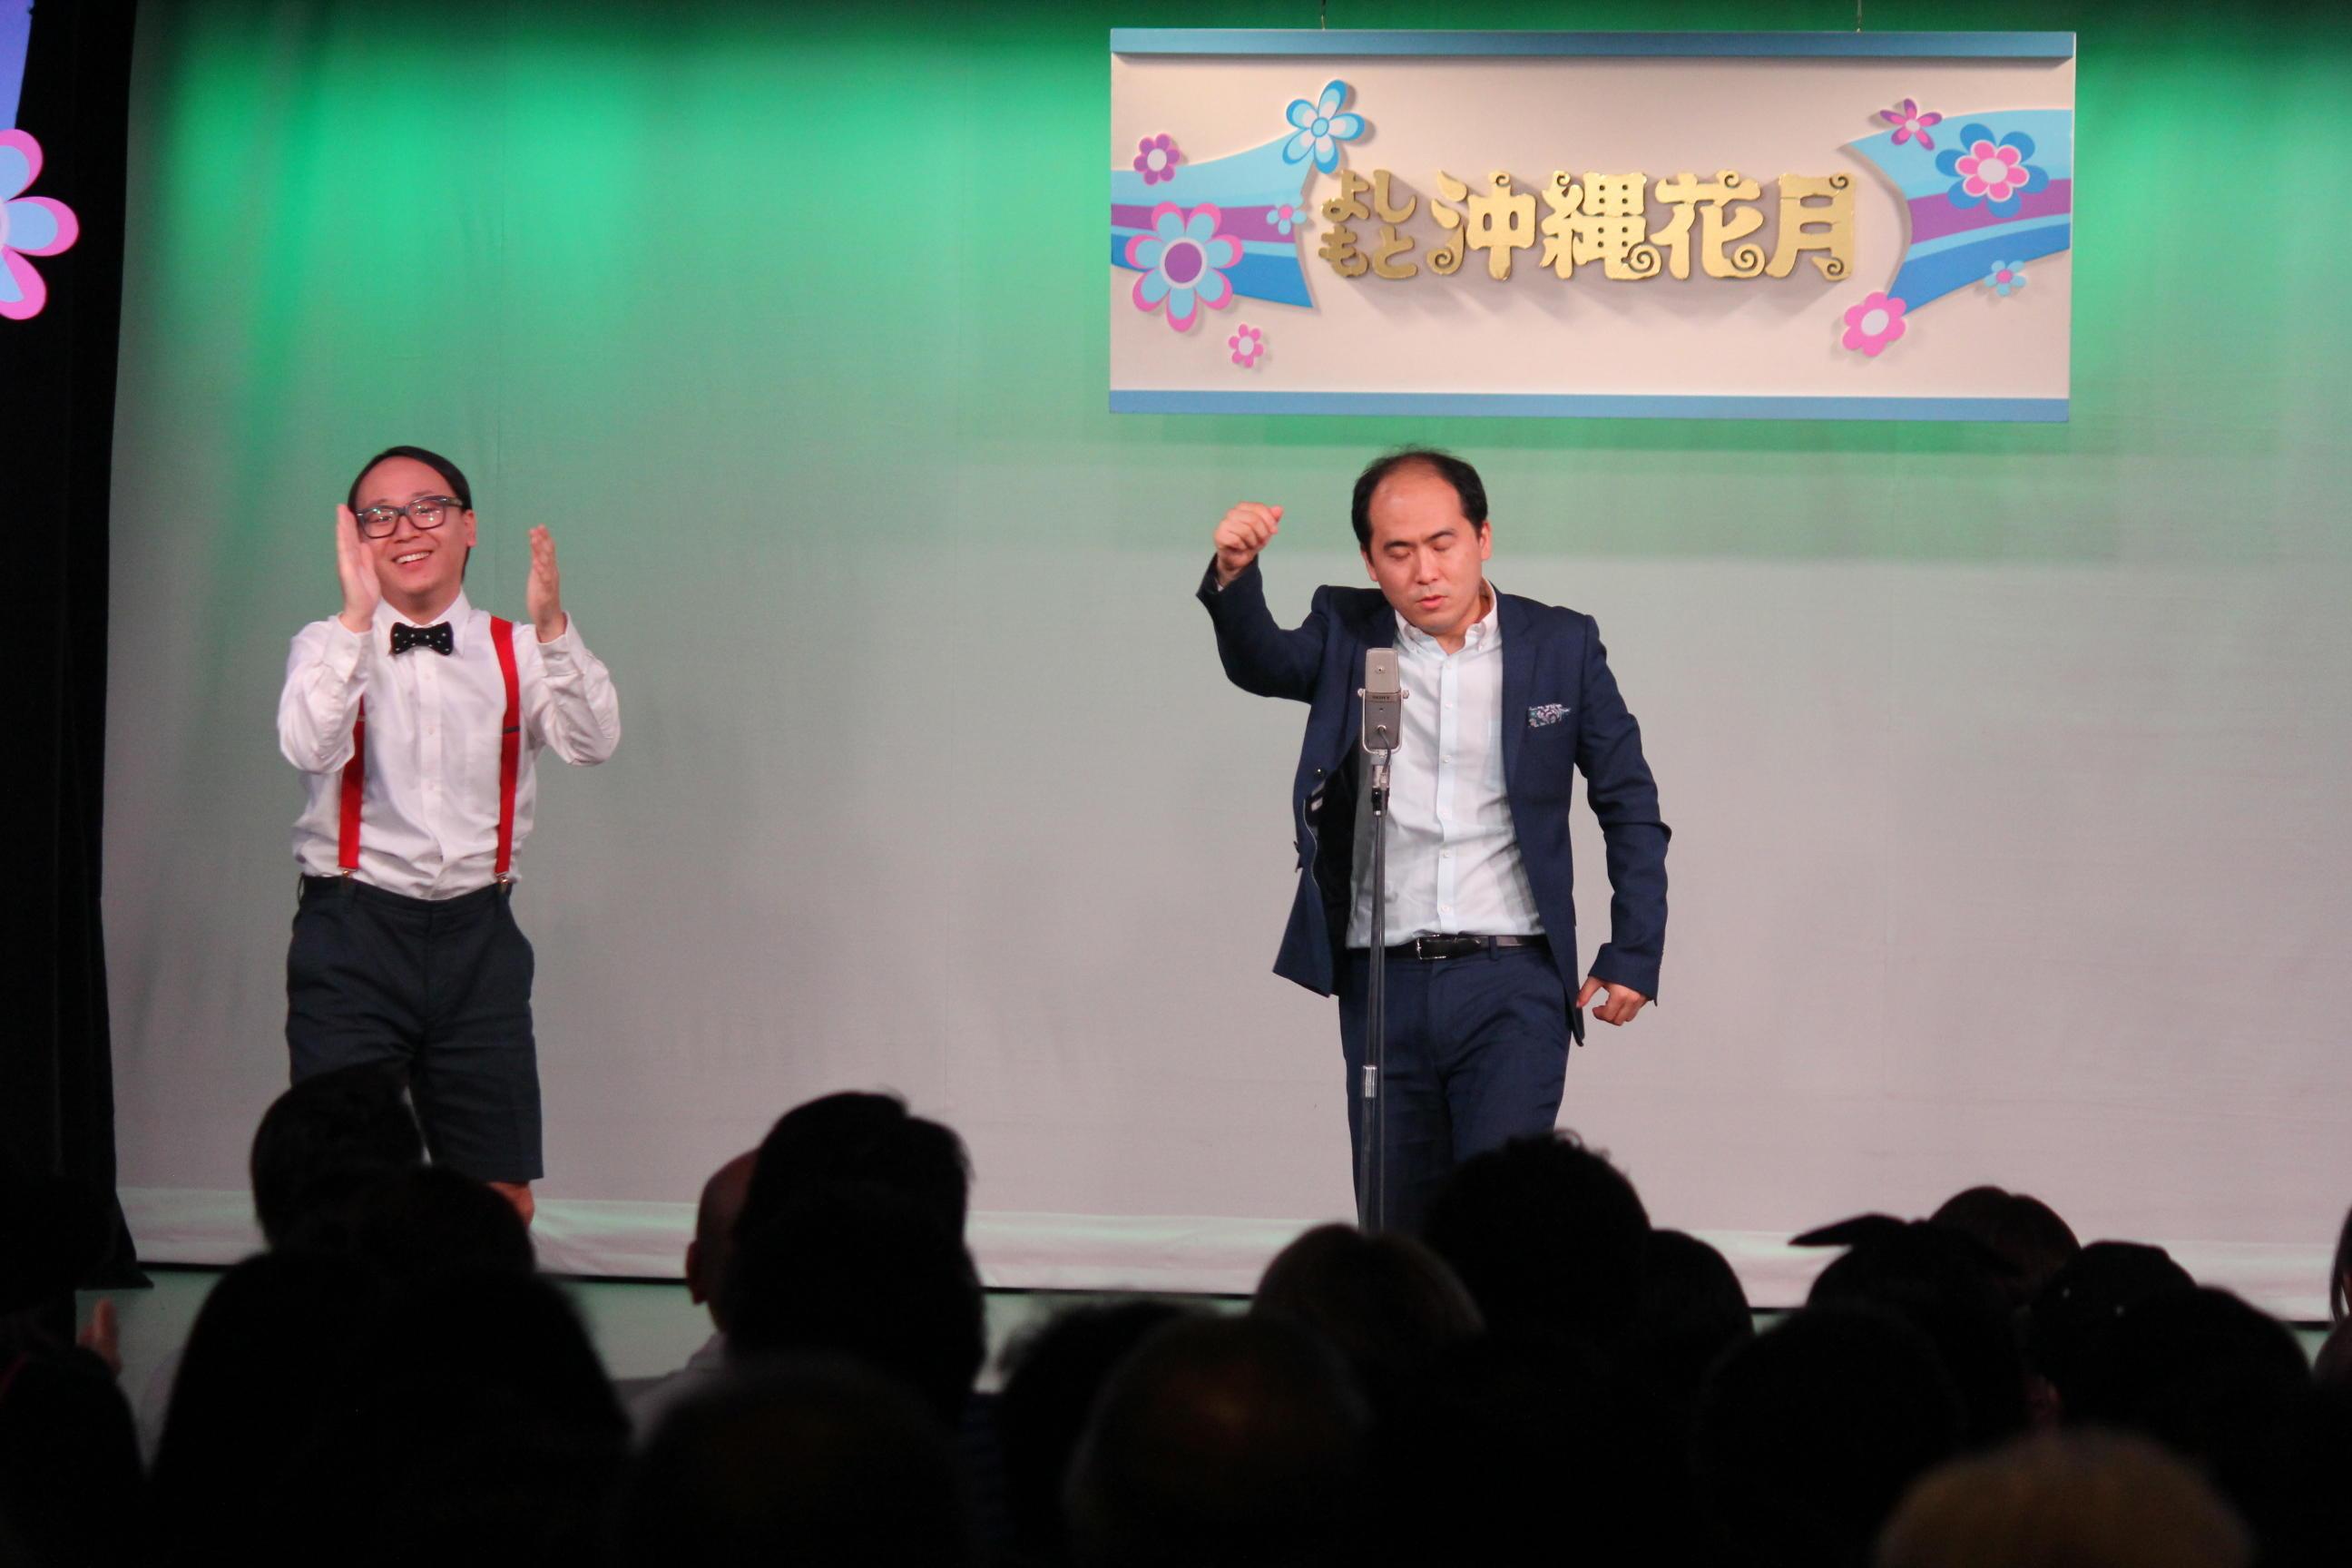 http://news.yoshimoto.co.jp/20151201140230-b8eb03b95f909d2953a46895ca2f610a6206a31e.jpg